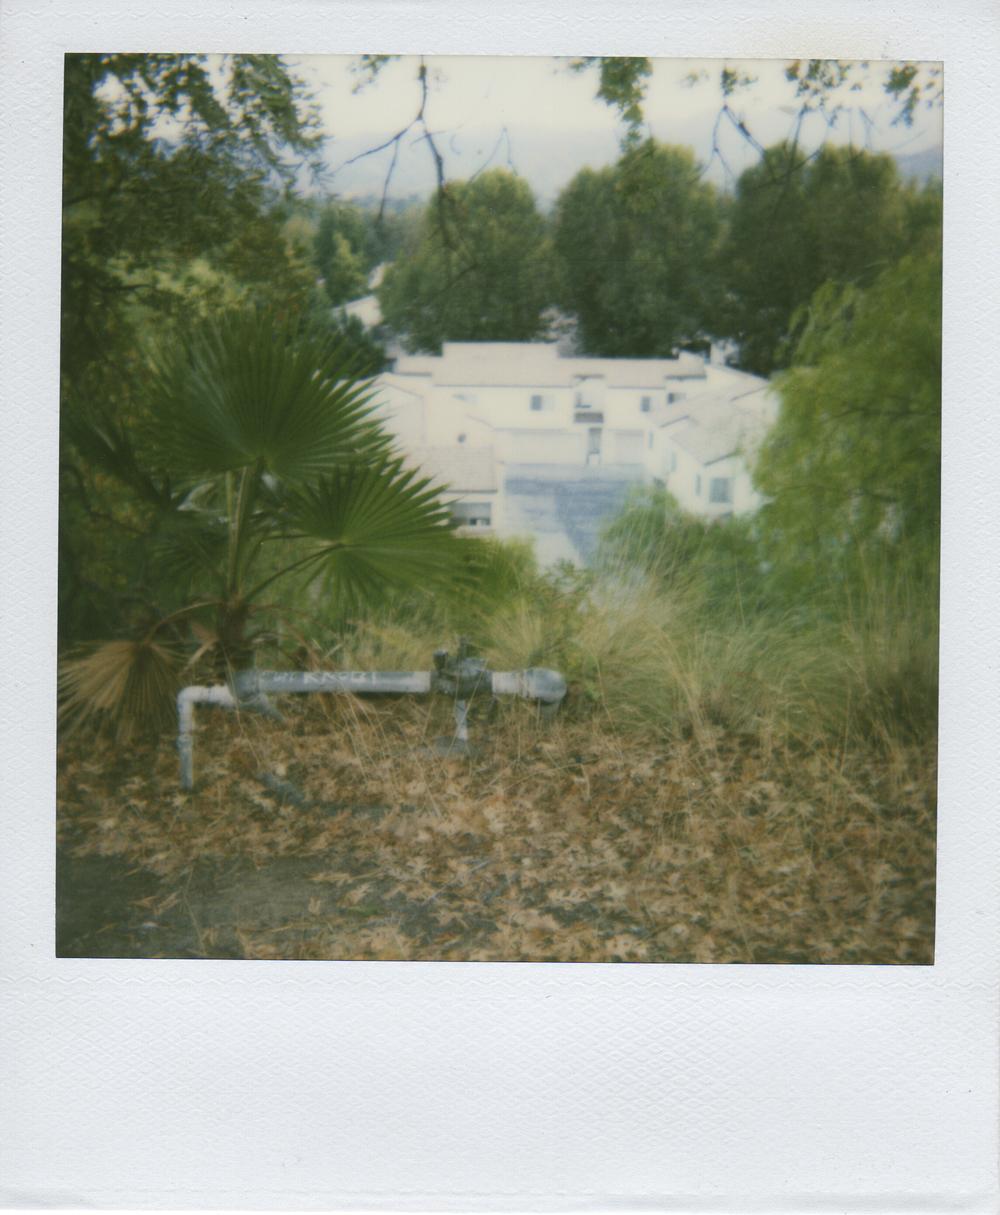 jlaurence-polaroid-054.jpg